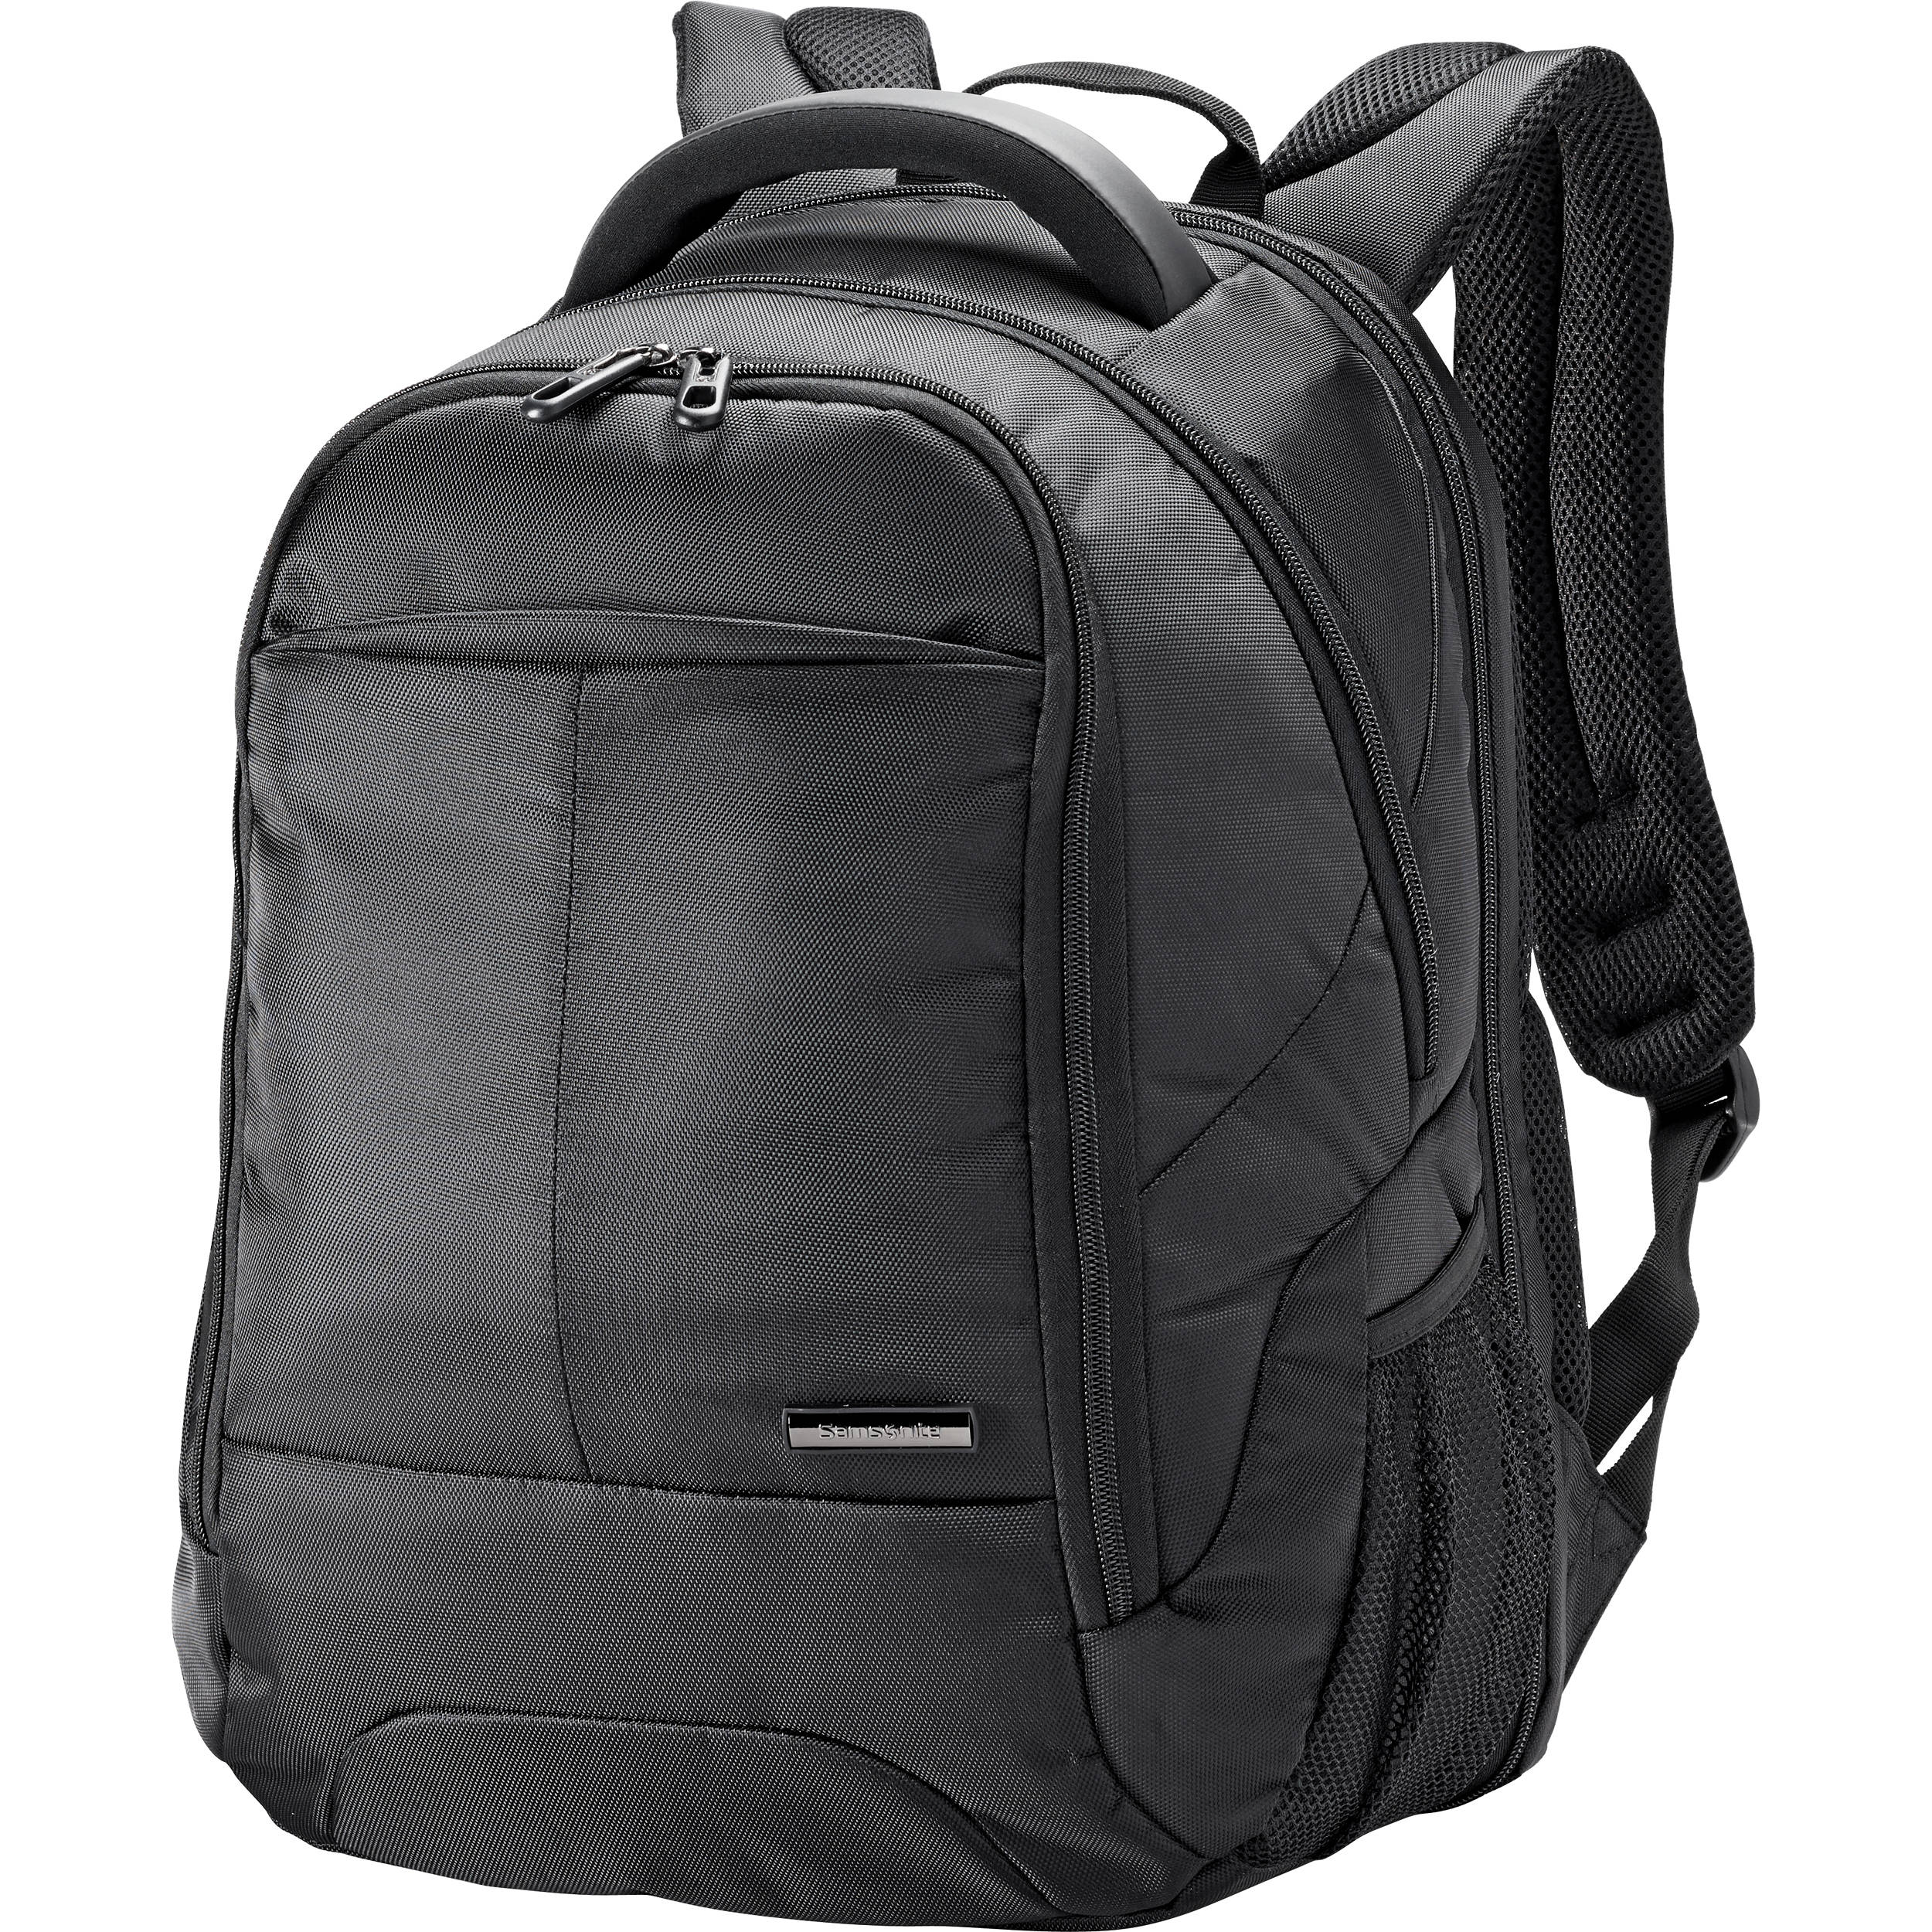 7666f1f71 Samsonite Classic Business Perfect Fit Backpack 55937-1041 B&H